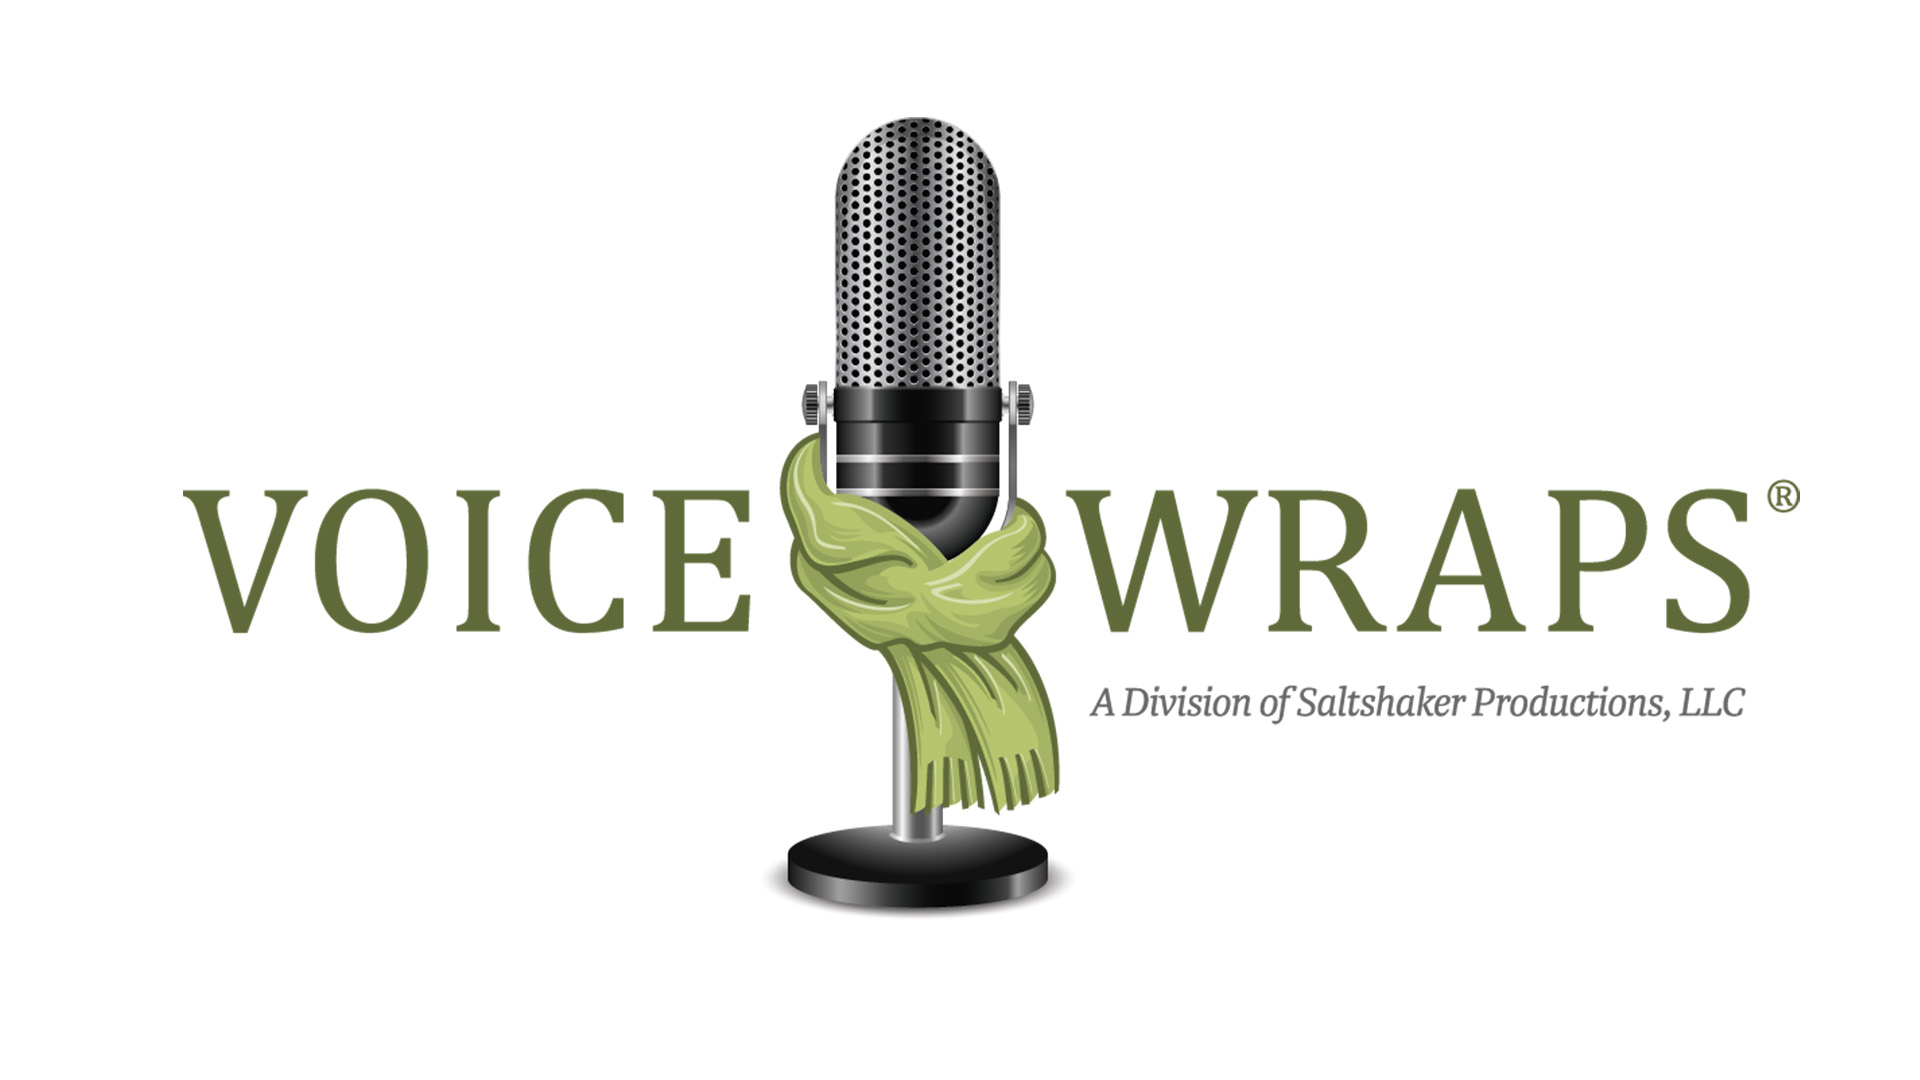 Voice Wraps